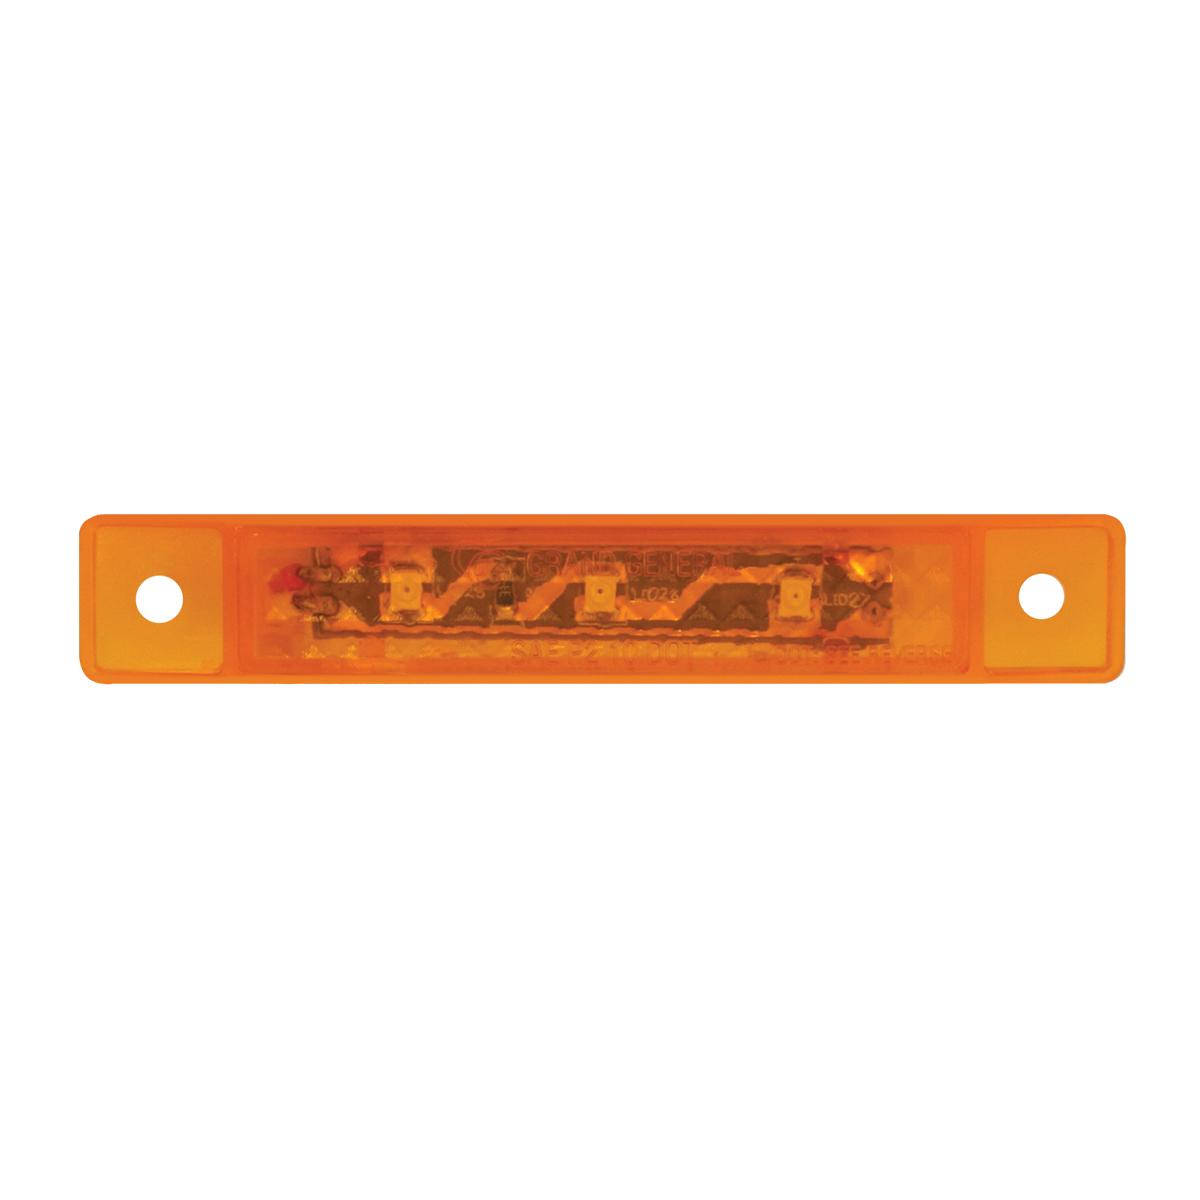 "76280 3.5"" Ultra Thin LED Marker Light"